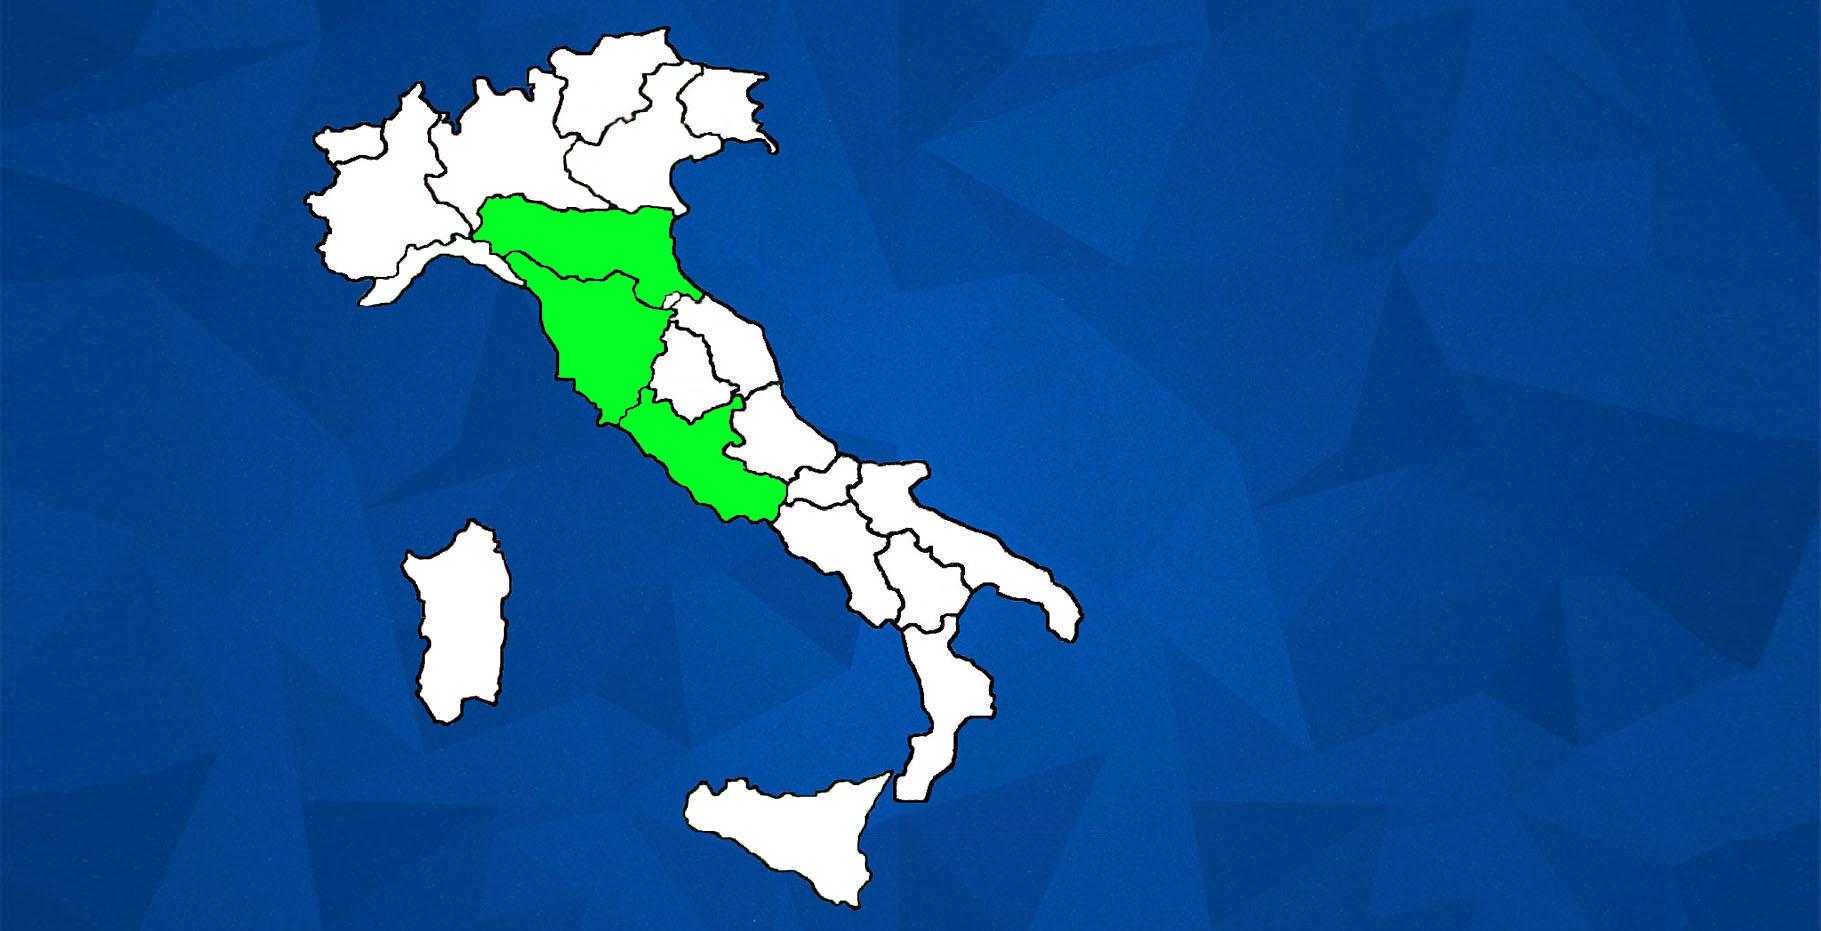 CIV ITALY MAP